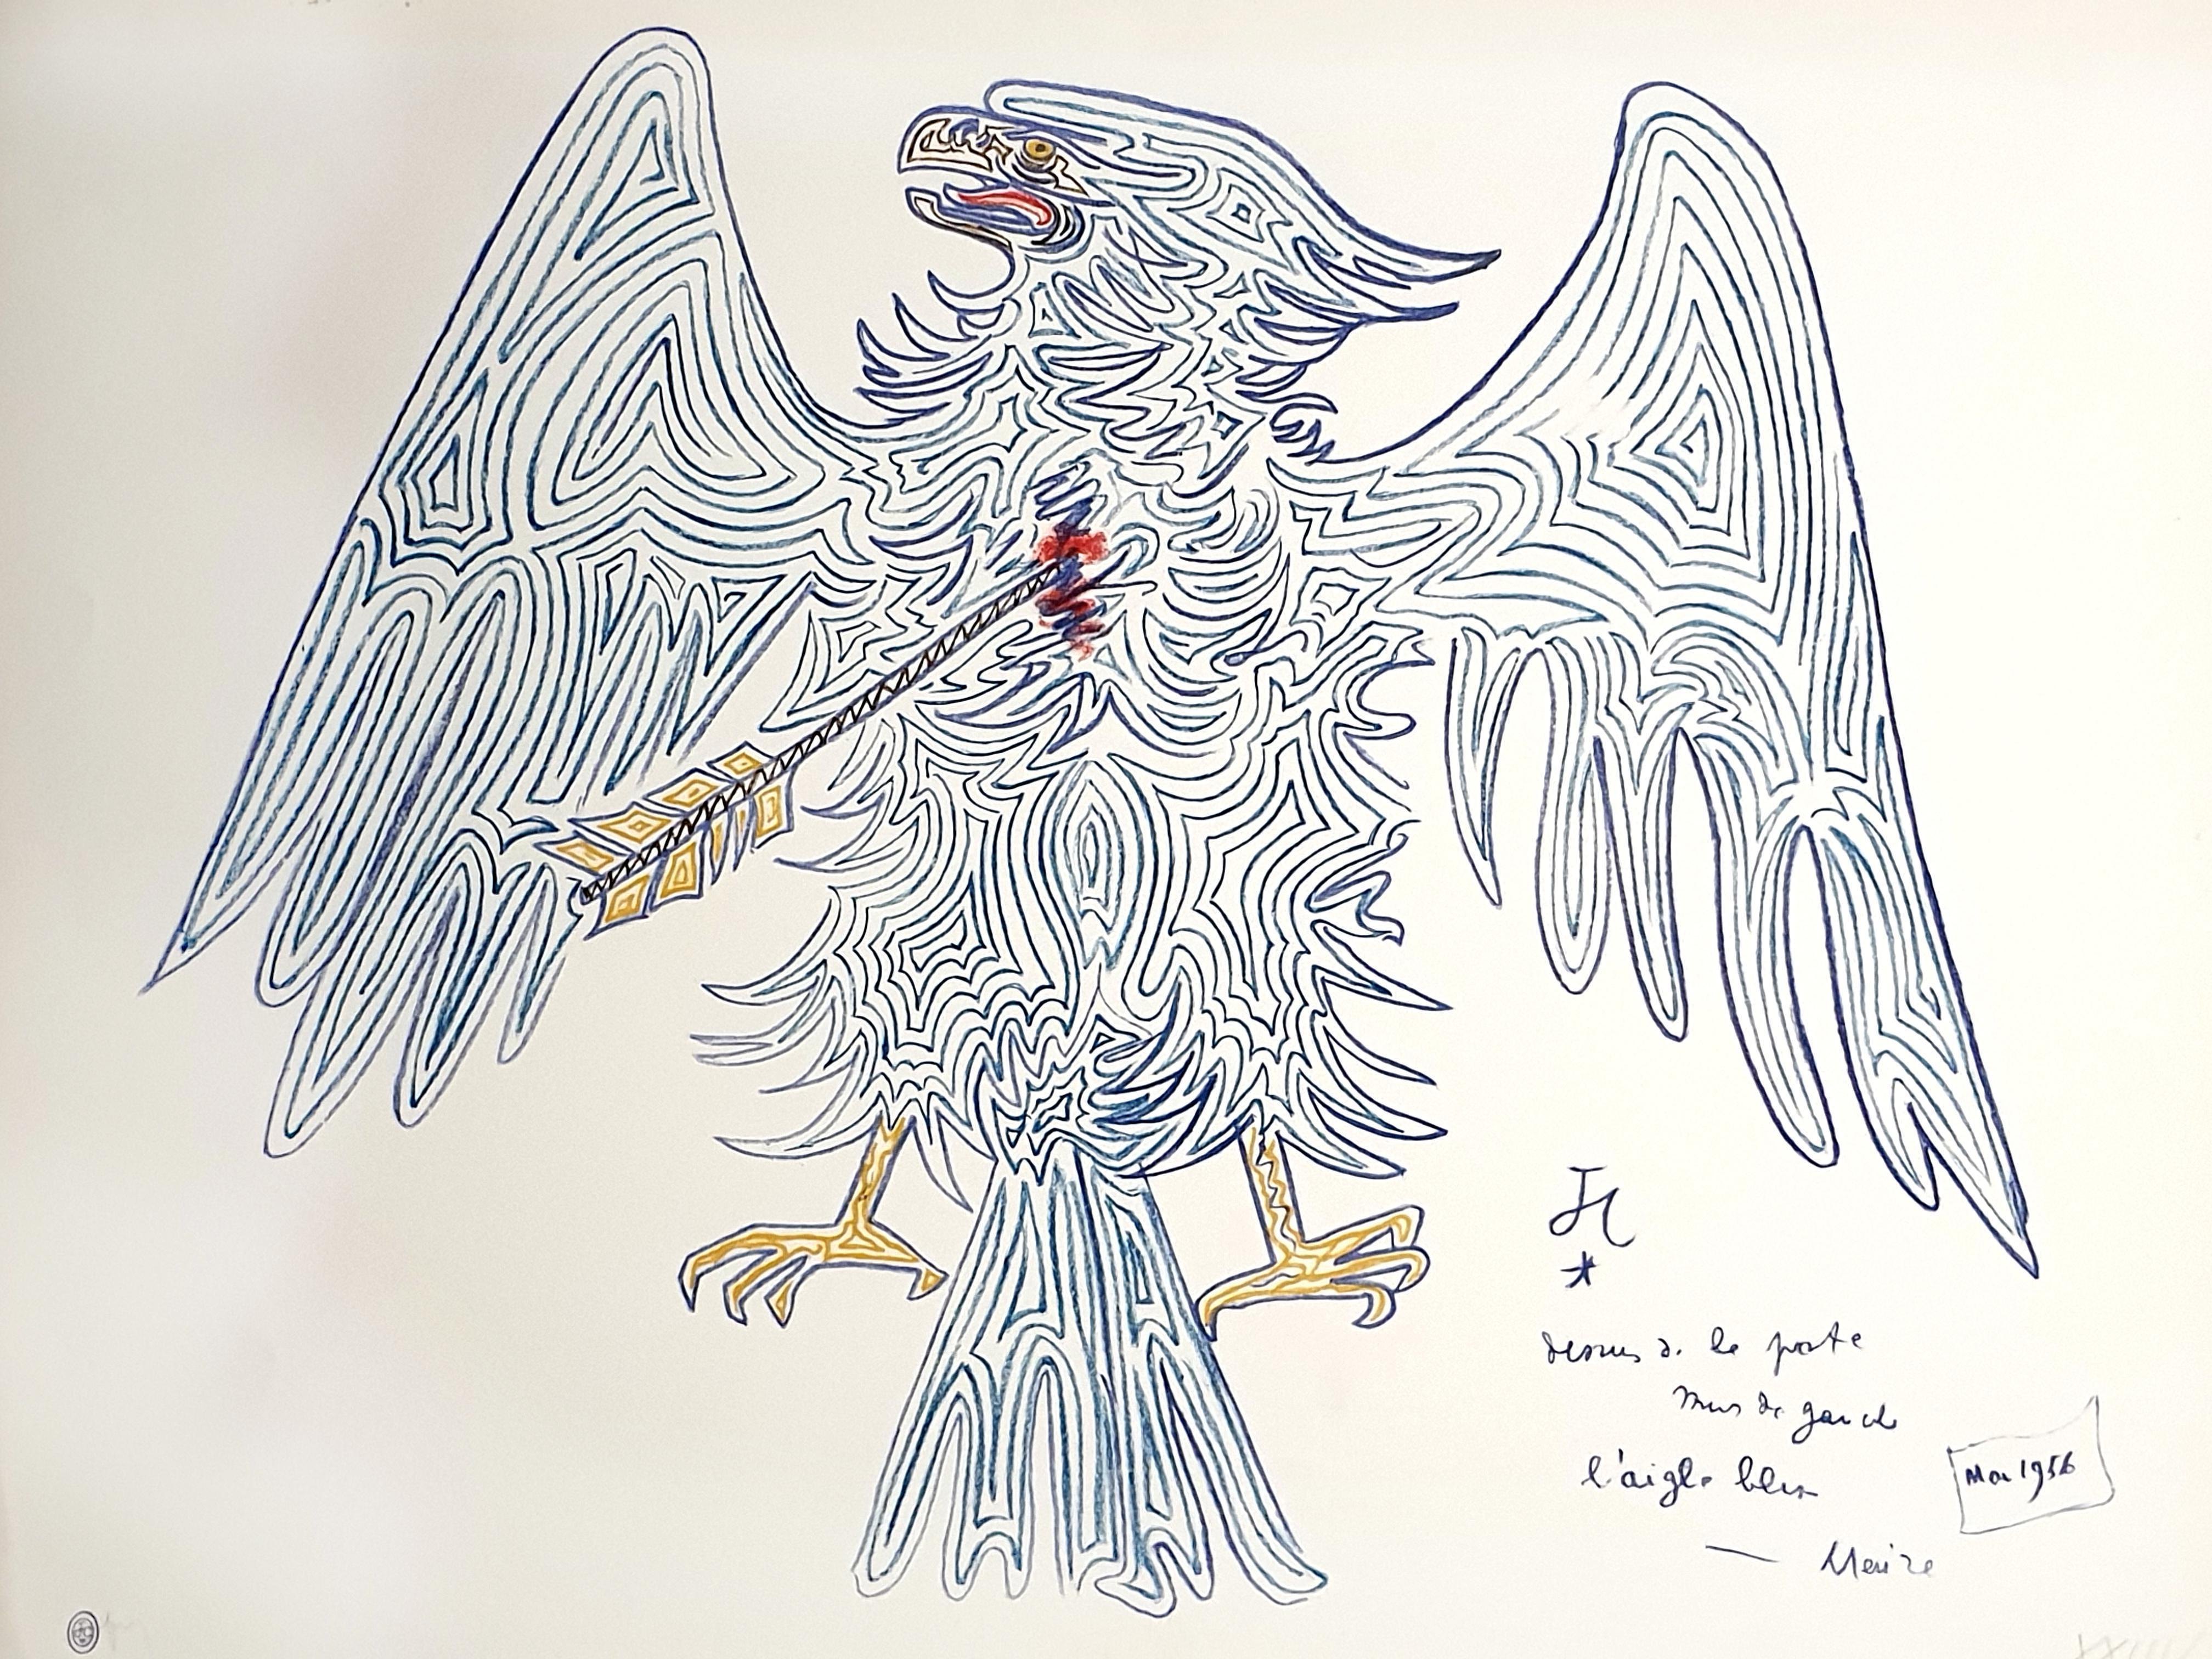 Jean Cocteau - Blue Eagle - Original Lithograph